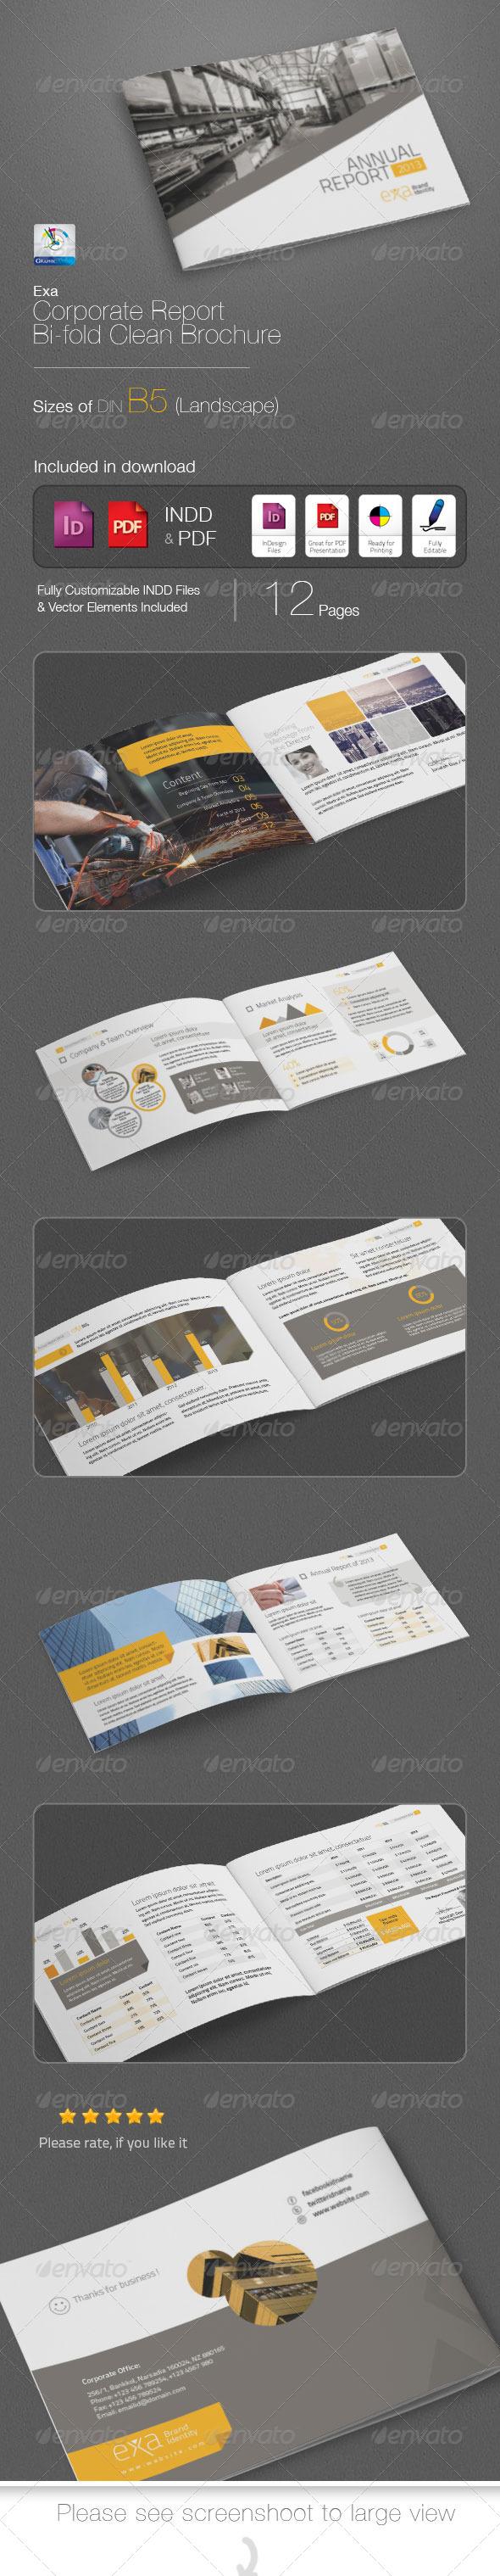 GraphicRiver Exa Business Report B5 Brochure 4916819